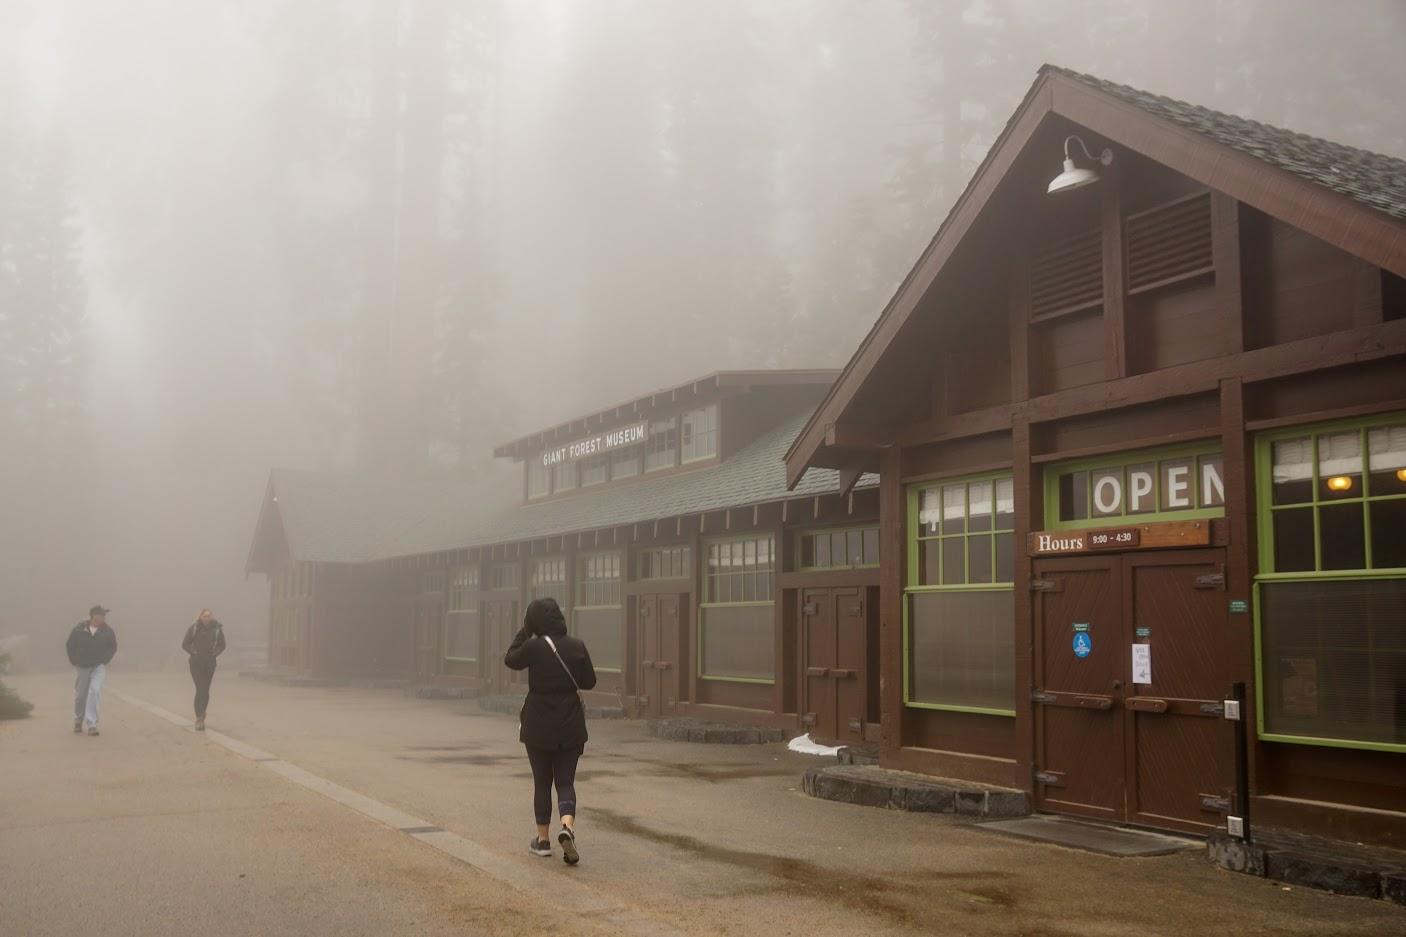 Sequoia National Park Visitor Centre